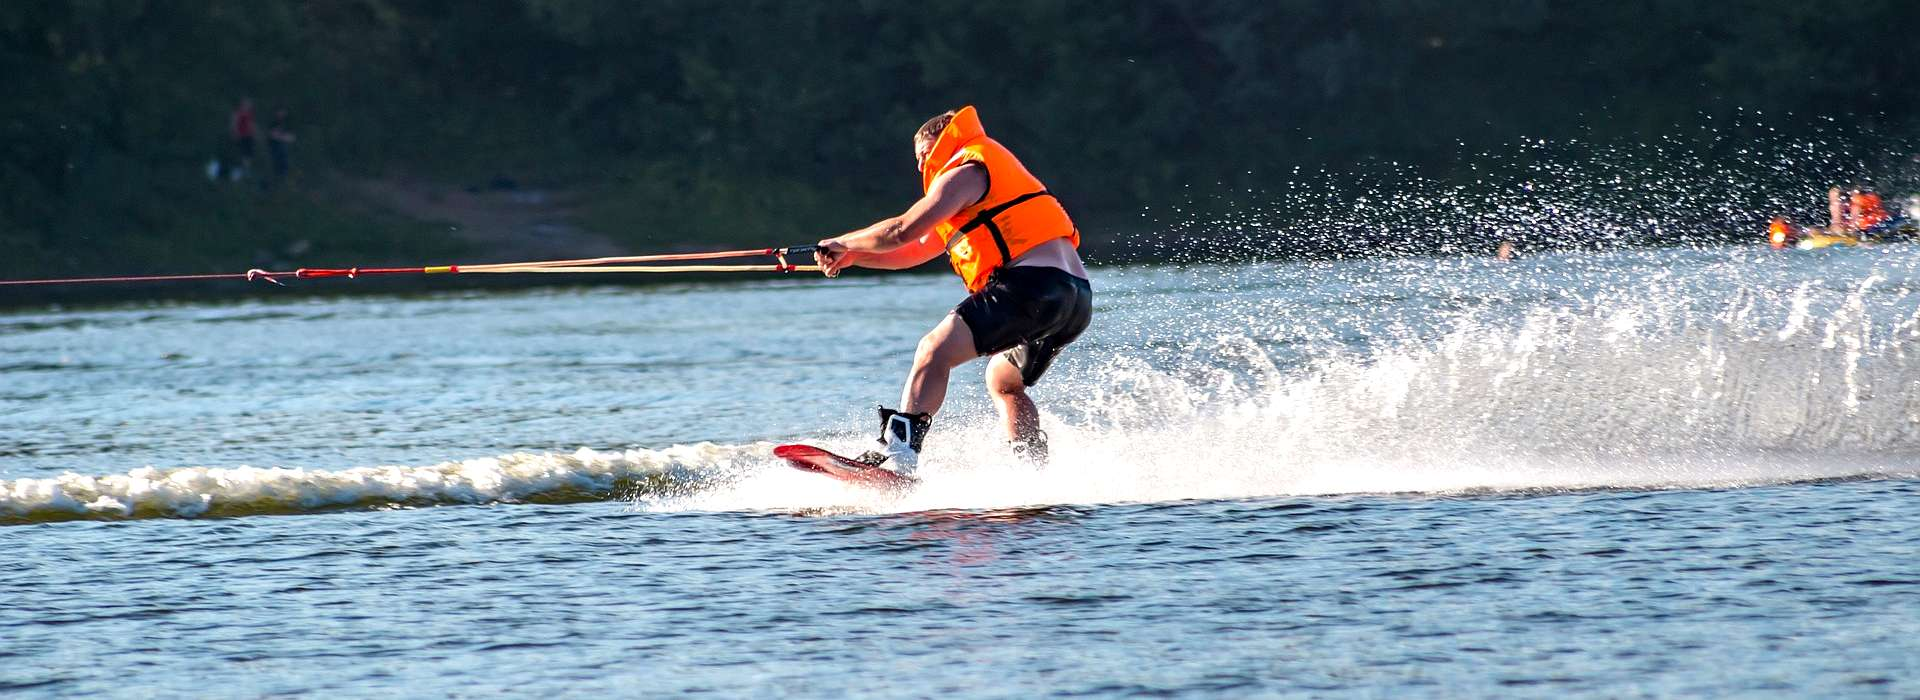 Sport - Park-Hotel Inseli - wakeboarding-2629164_1920 - 1920x700